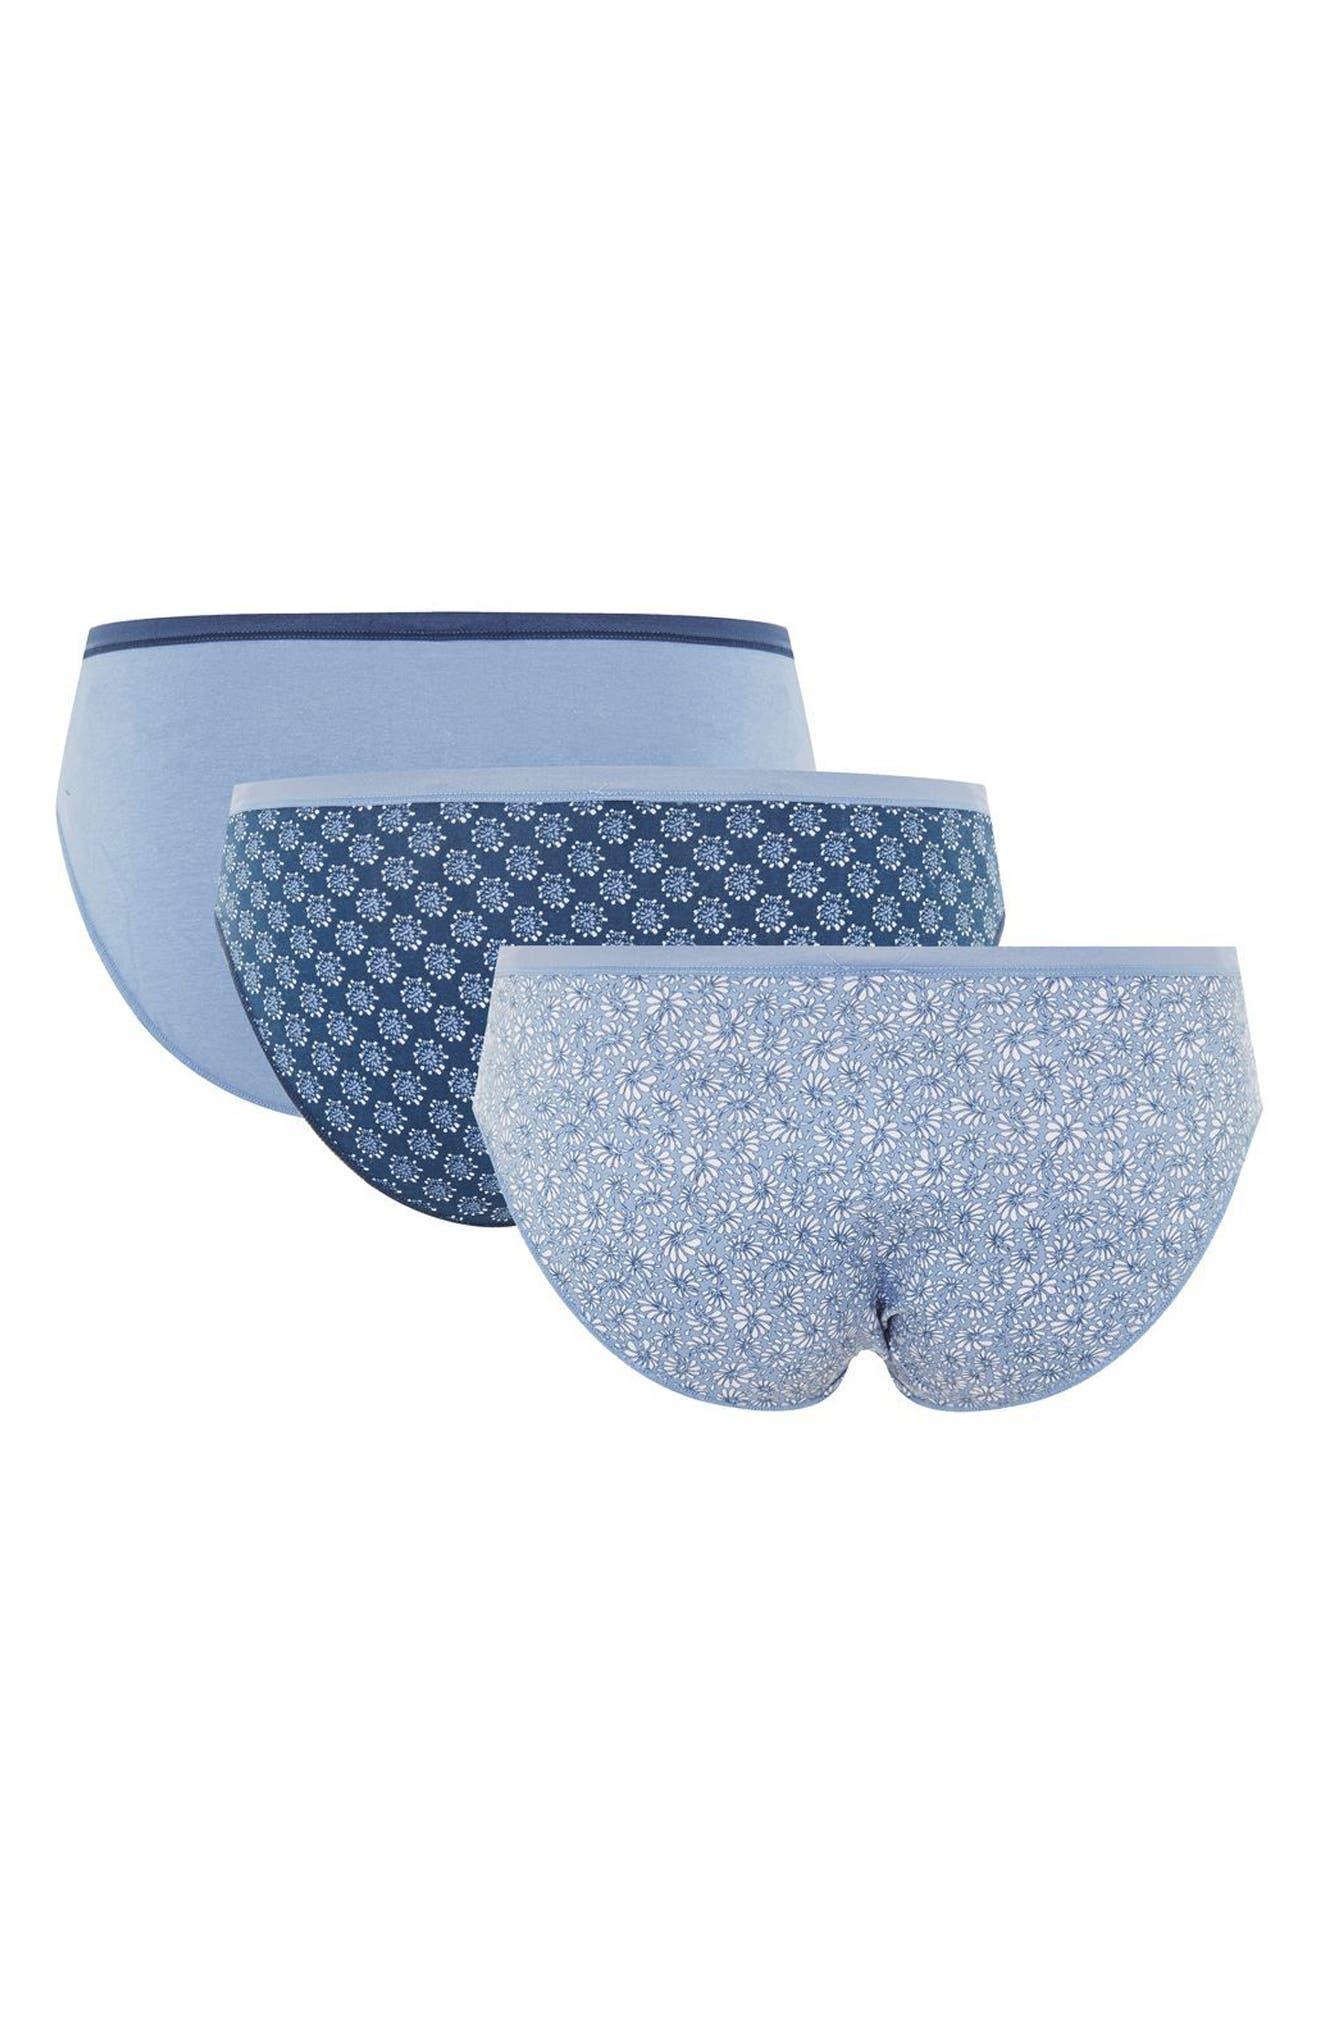 Set of 3 Panties,                             Alternate thumbnail 2, color,